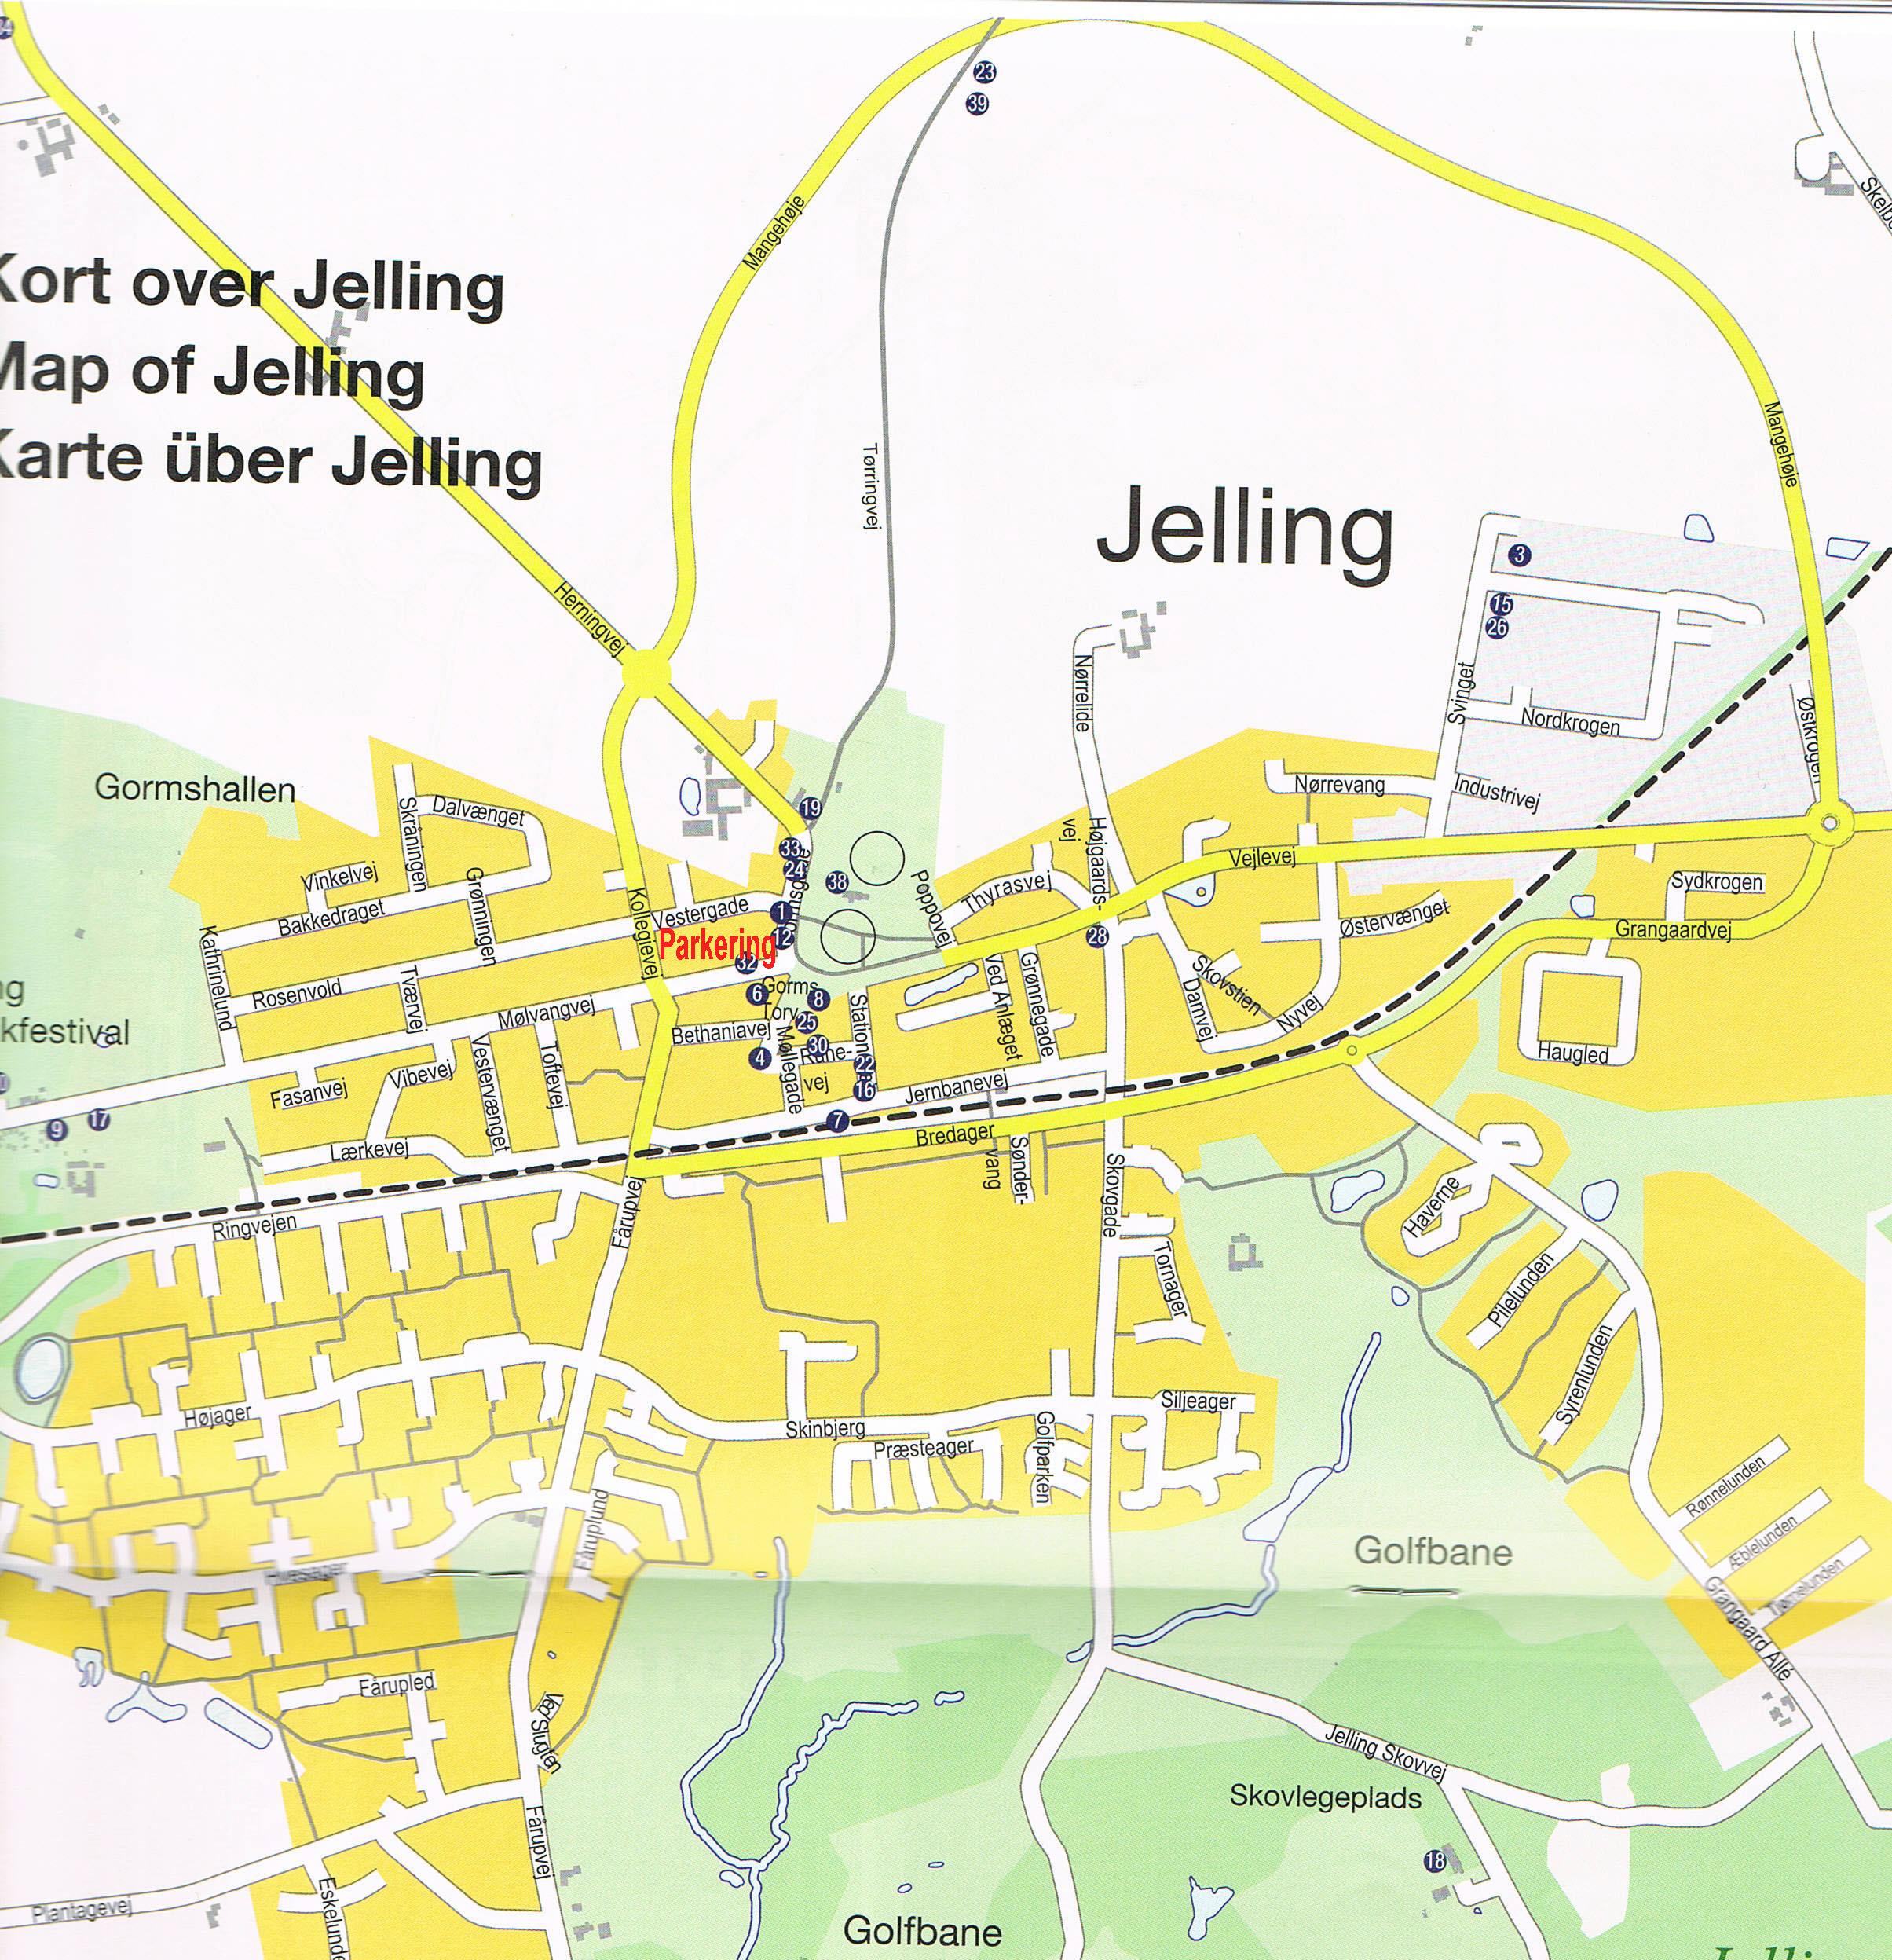 Kort Over Jelling